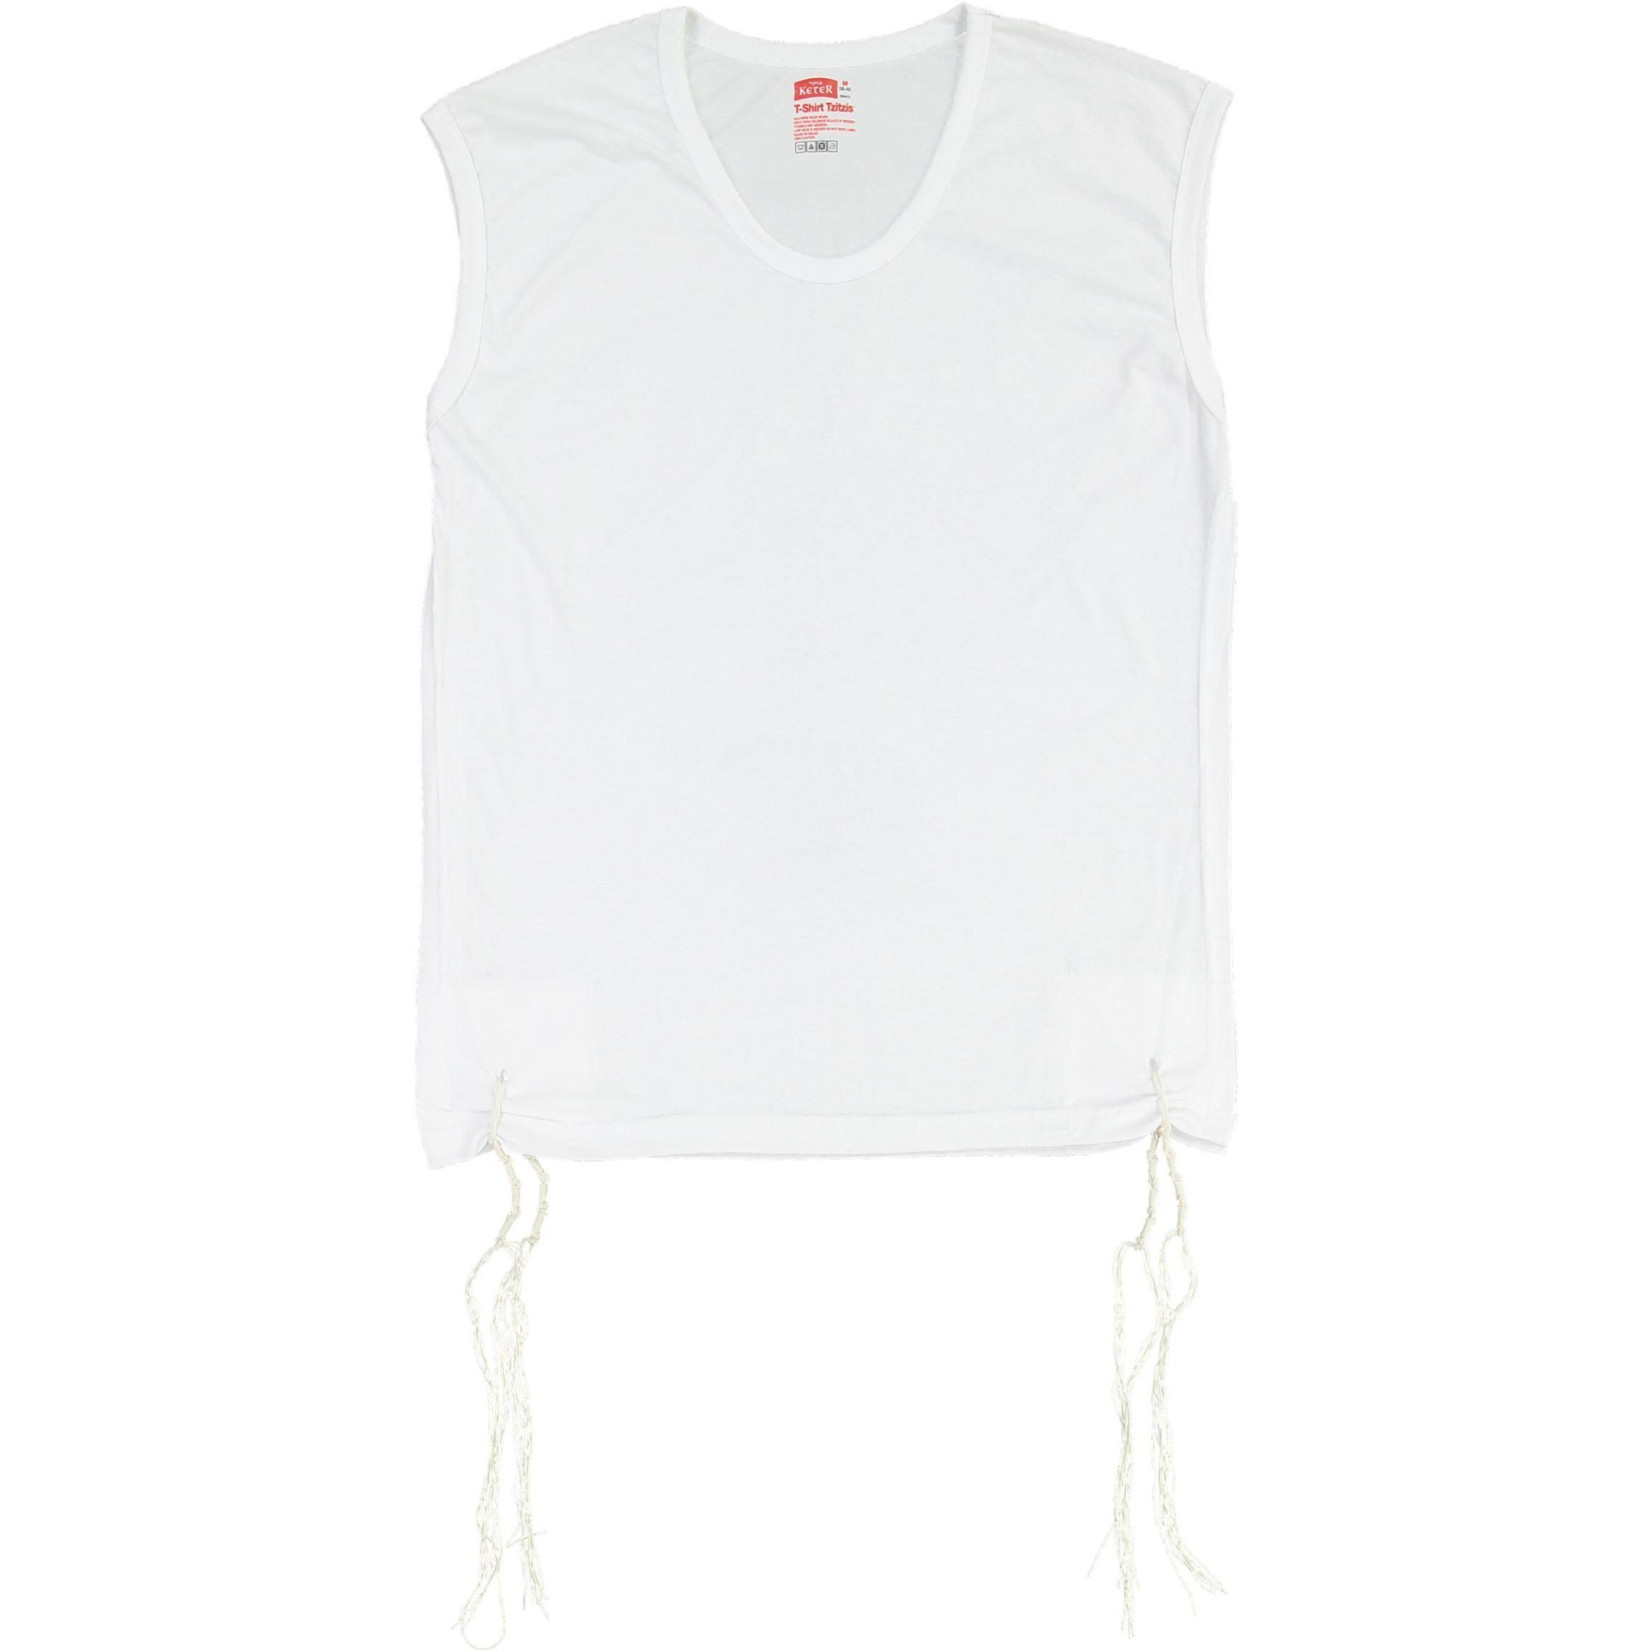 Undershirt-Style Arbah Kanfot, 100% Cotton, Round Neck, Size 6